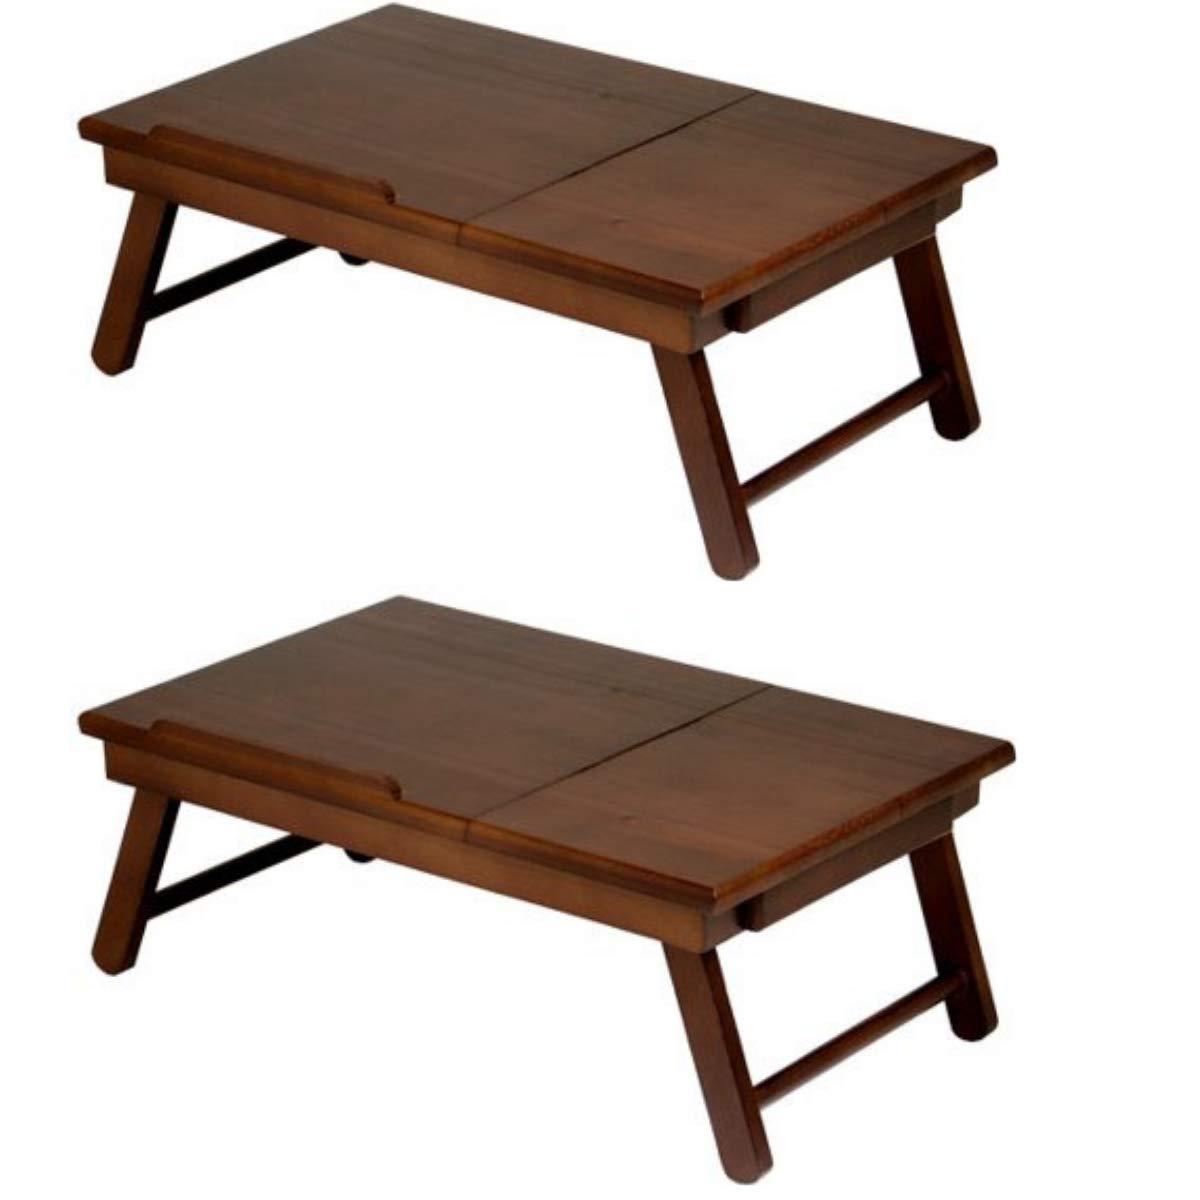 Winsome Wood 94623 Alden Bed Tray, Walnut (Walnut, 2-Pack)